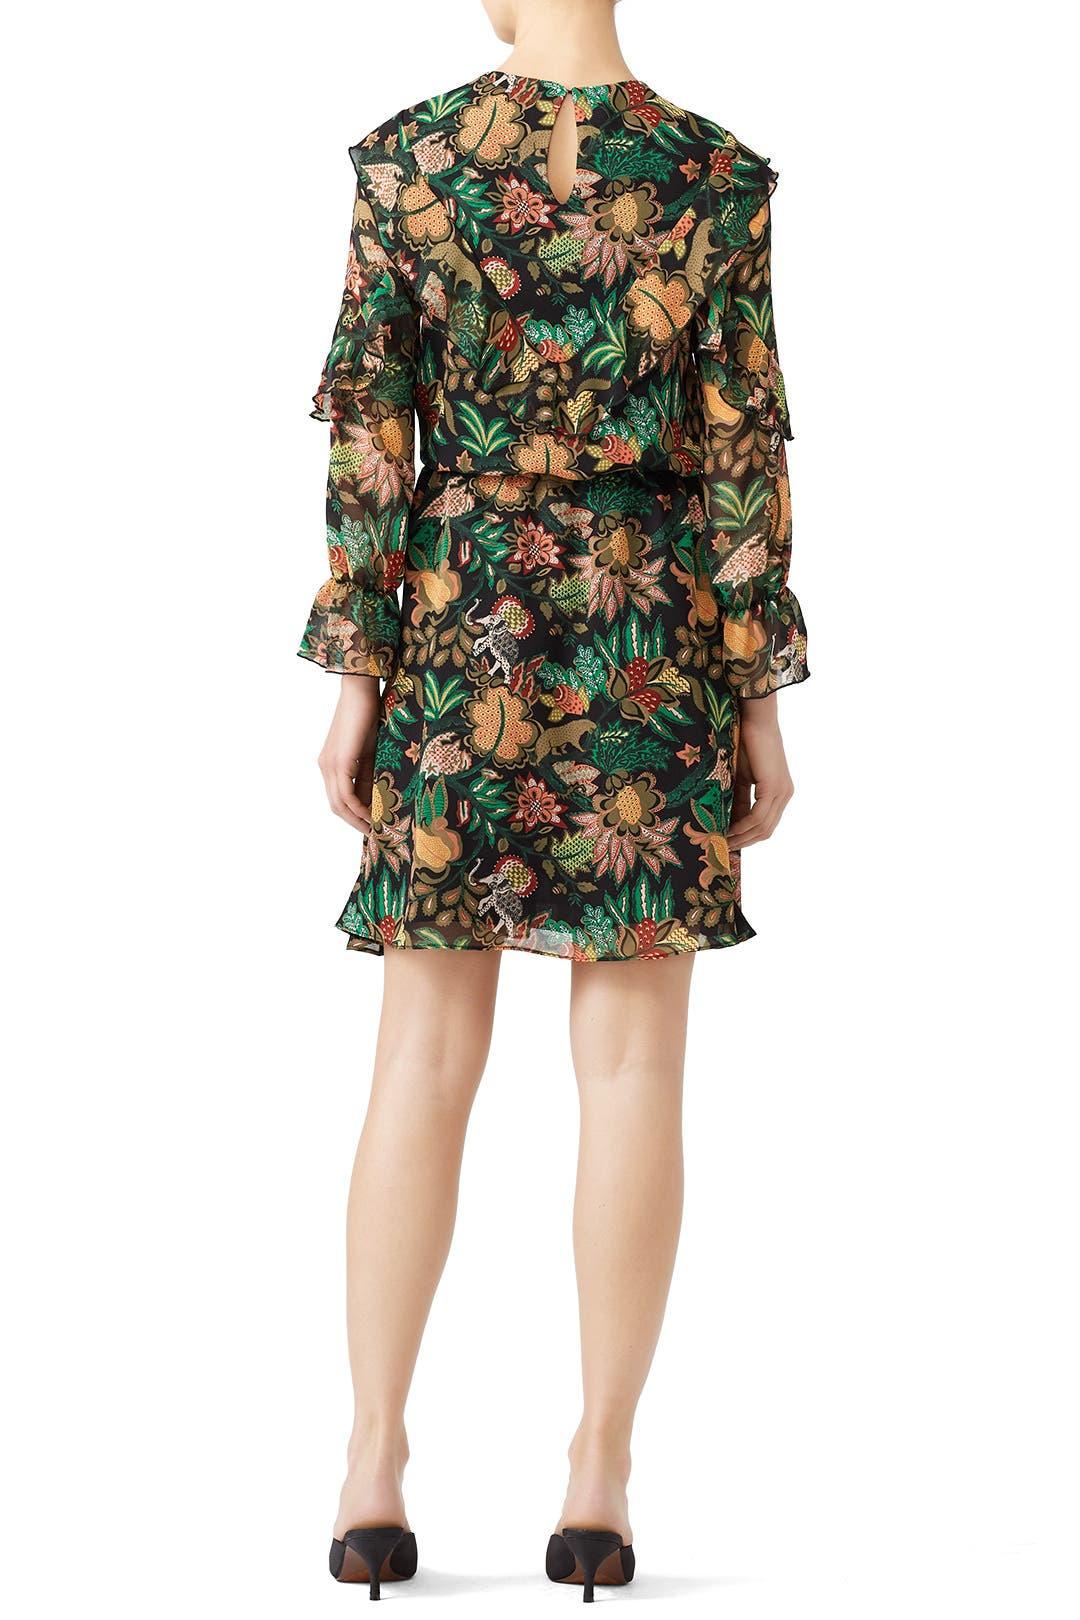 aa86567cde93 Ruffle Jungle Print Dress by Scotch & Soda for $30   Rent the Runway